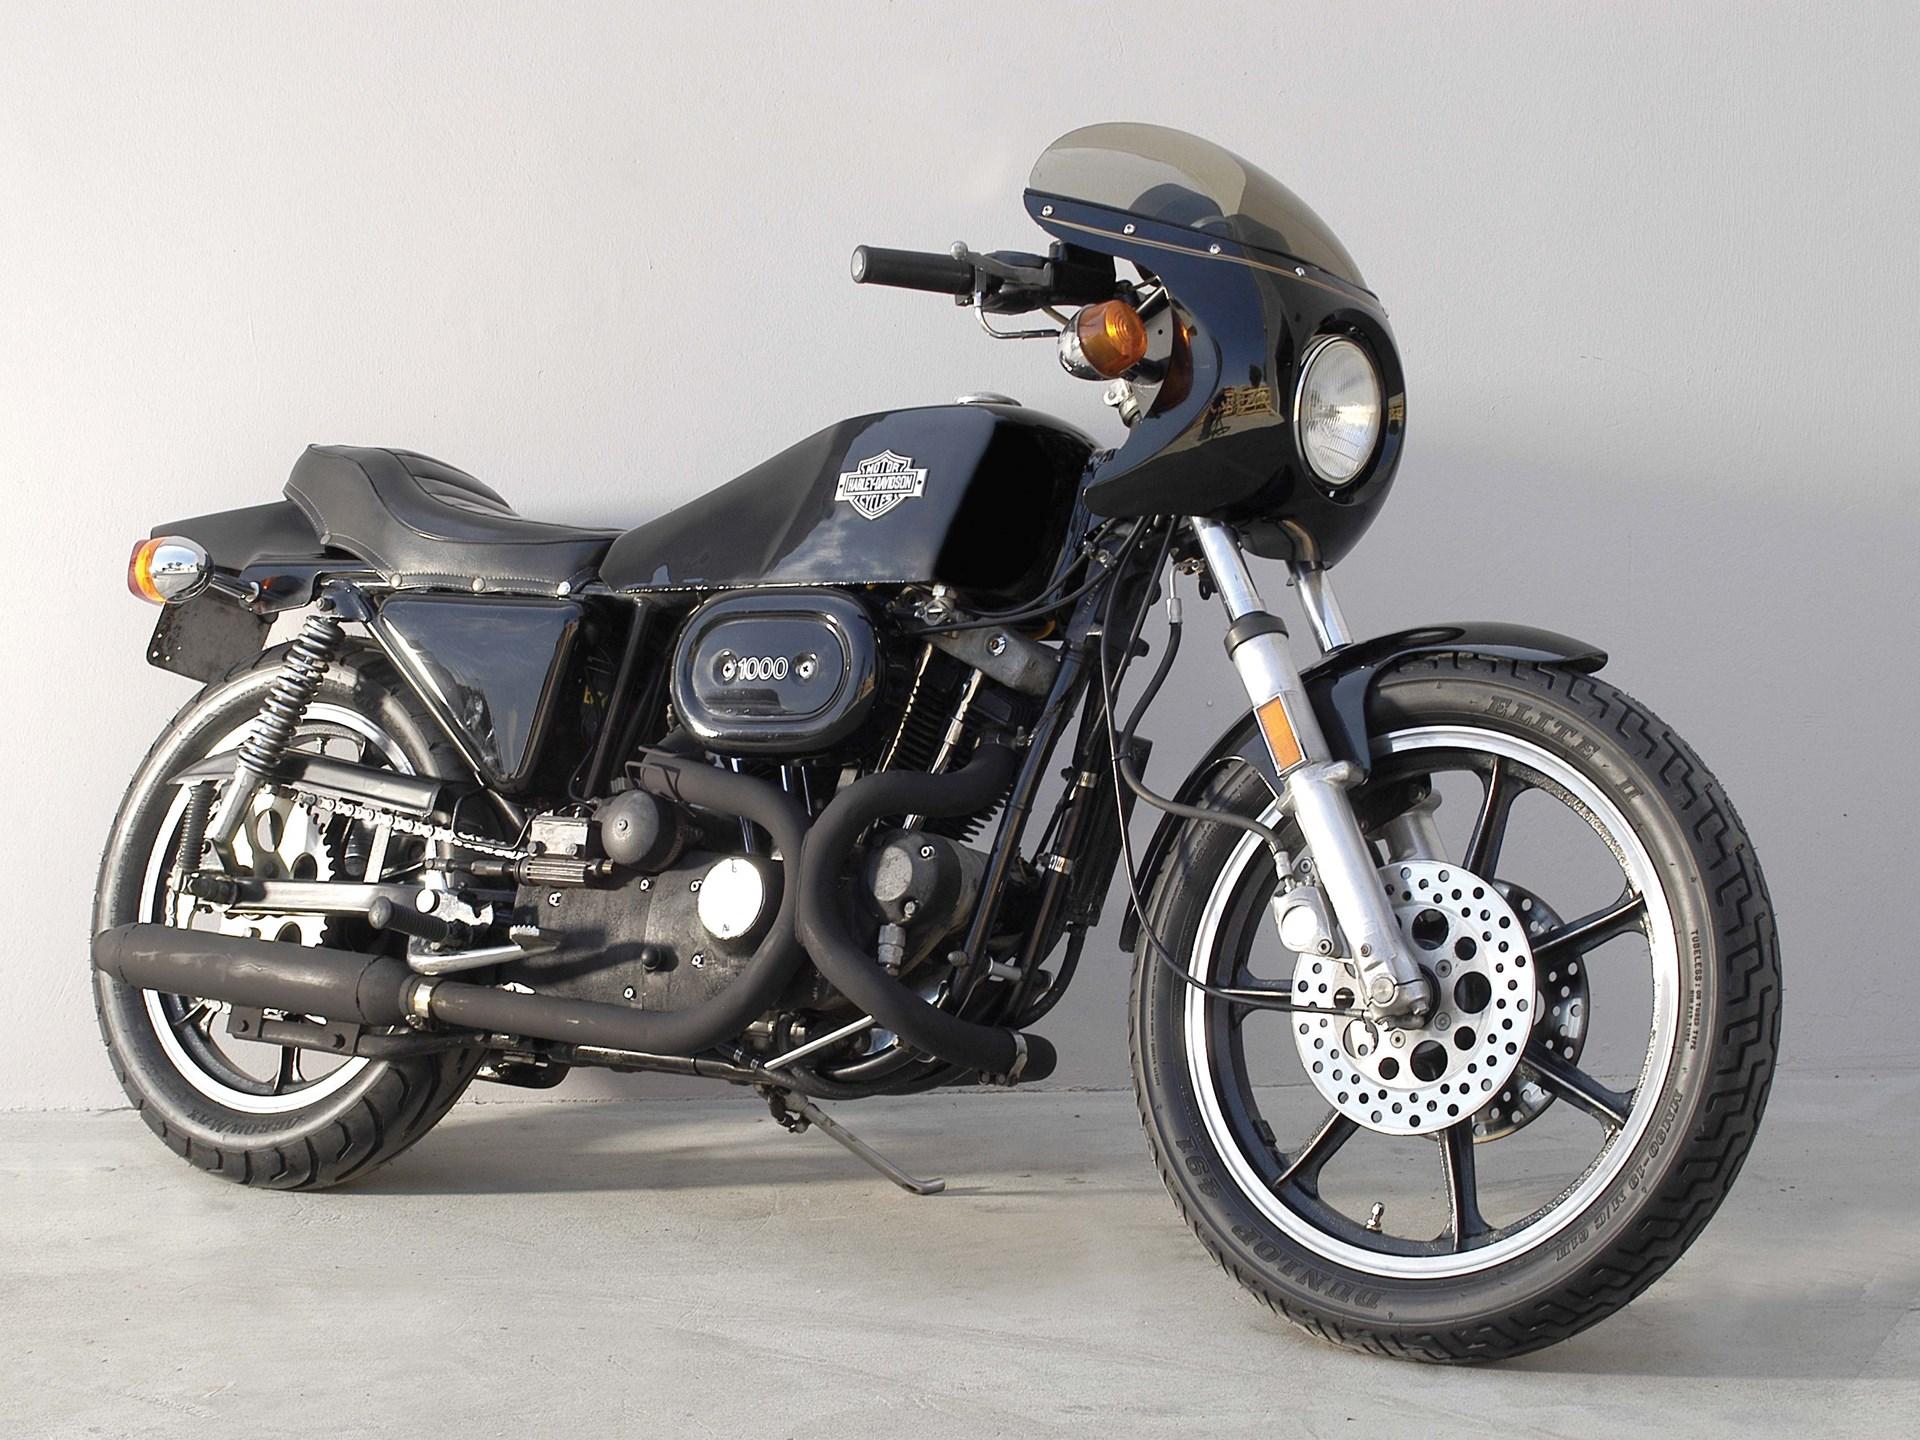 1978 Harley-Davidson XLCR 1000 Café Racer